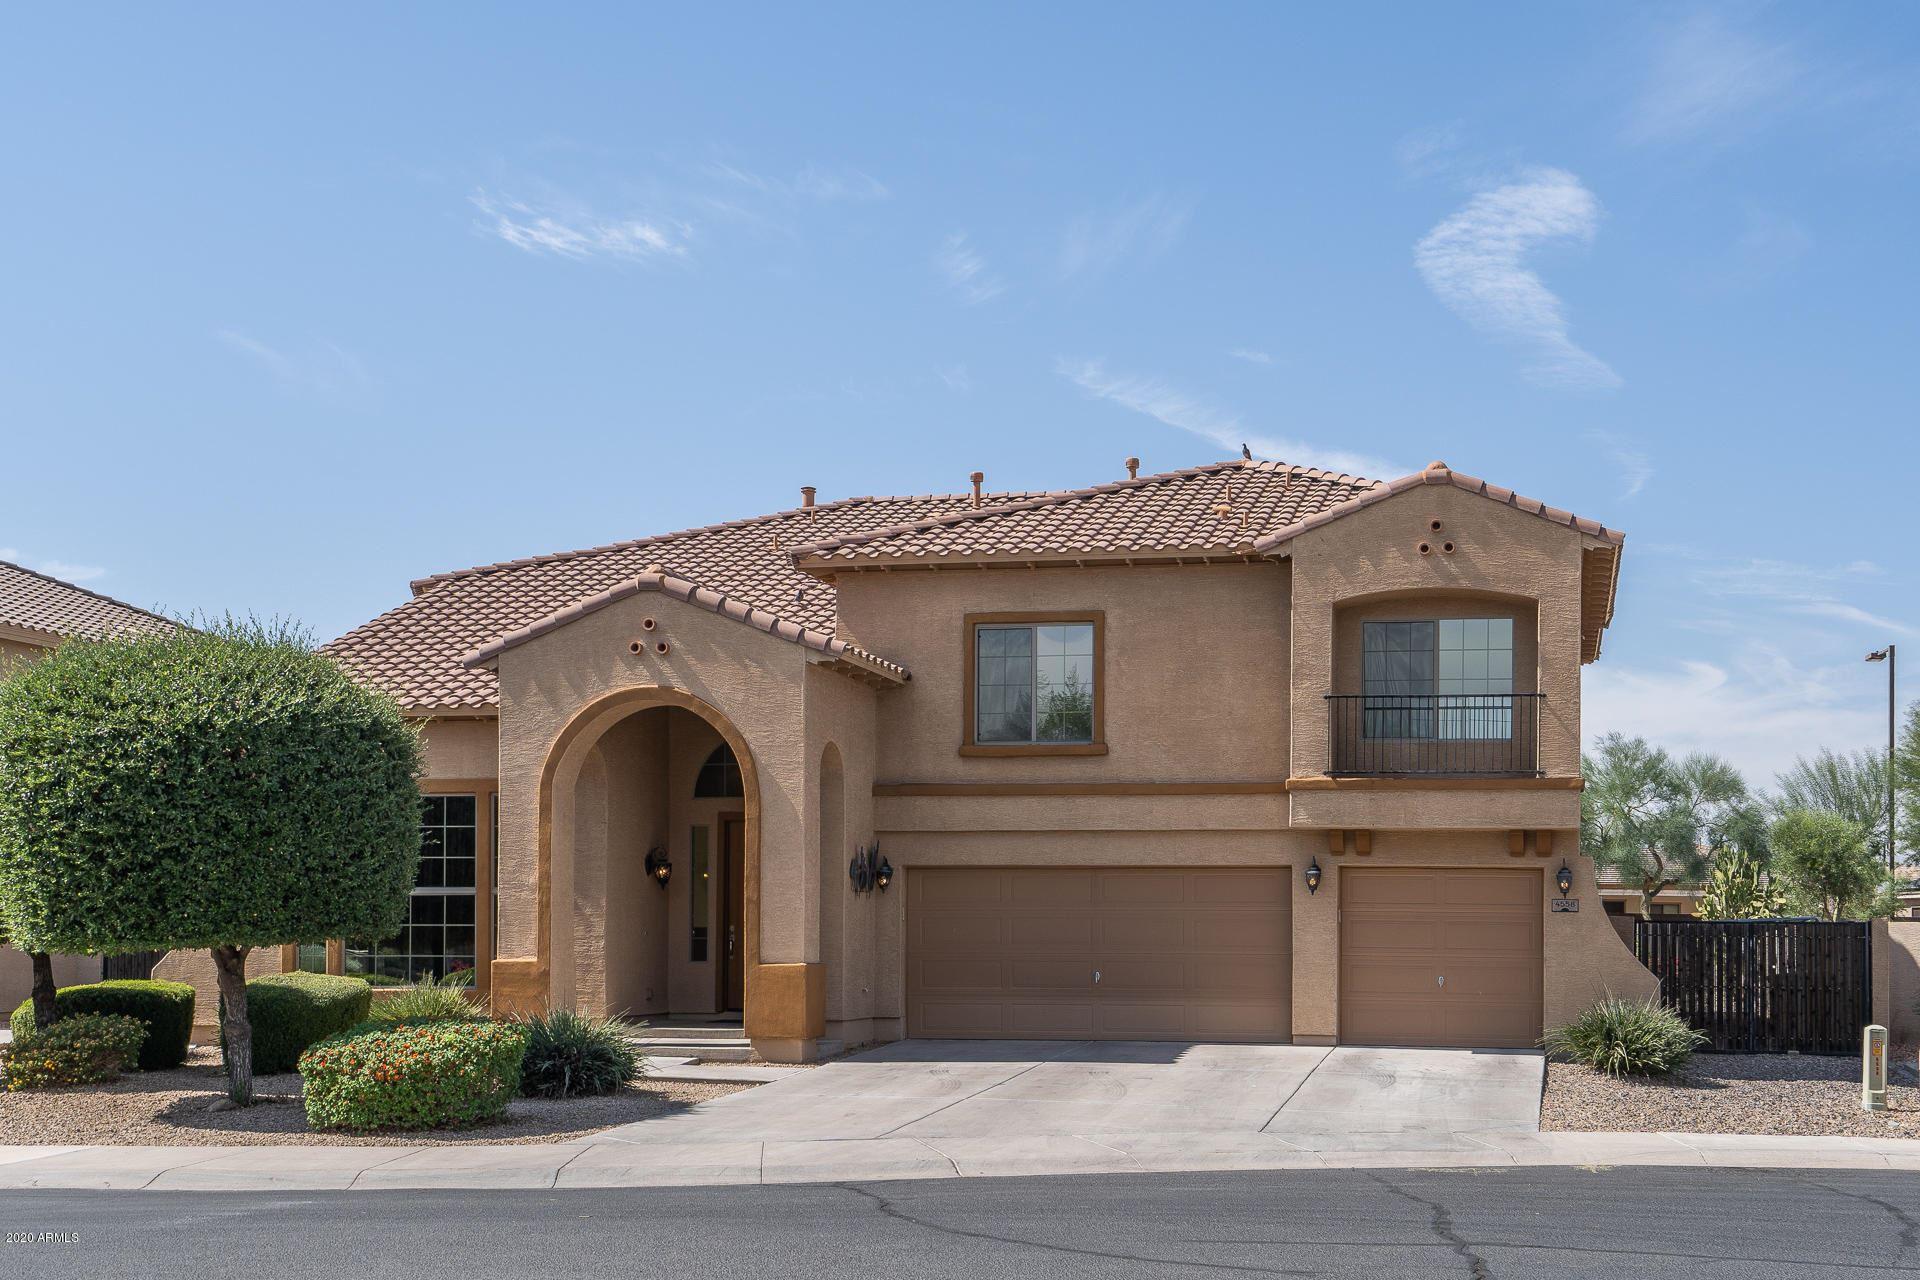 4558 N 153RD Lane, Goodyear, AZ 85395 - MLS#: 6119557